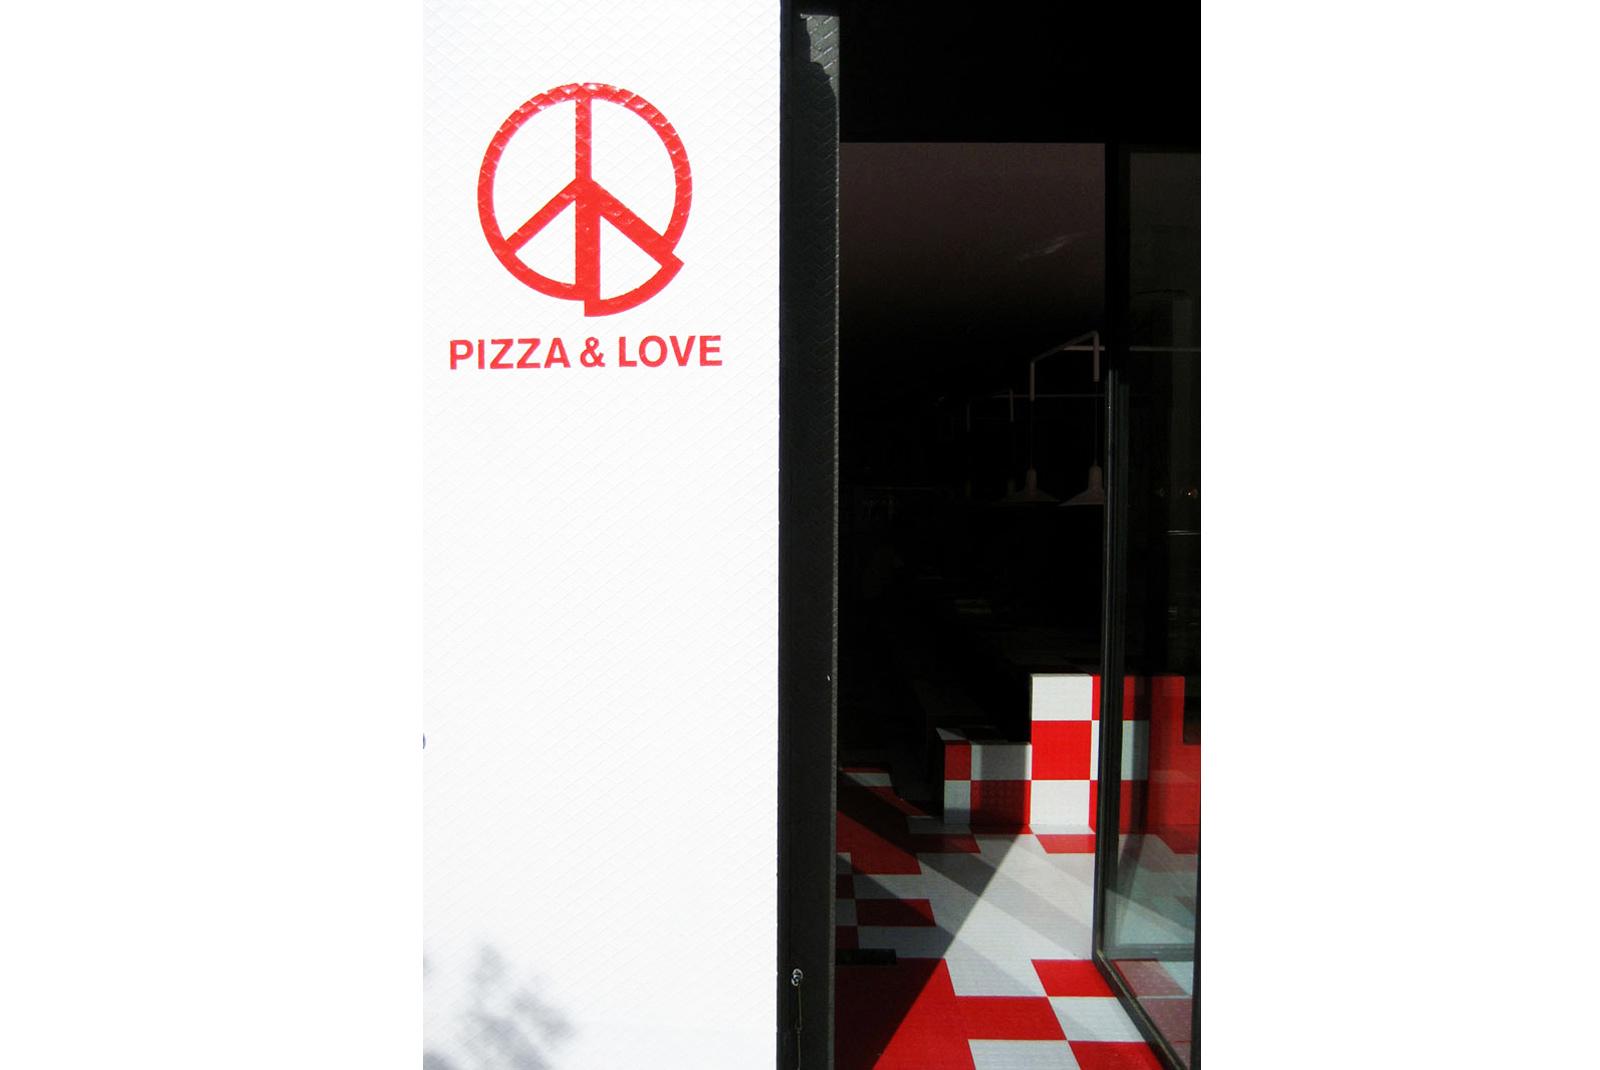 1-PizzaLove-entrance-2.jpg